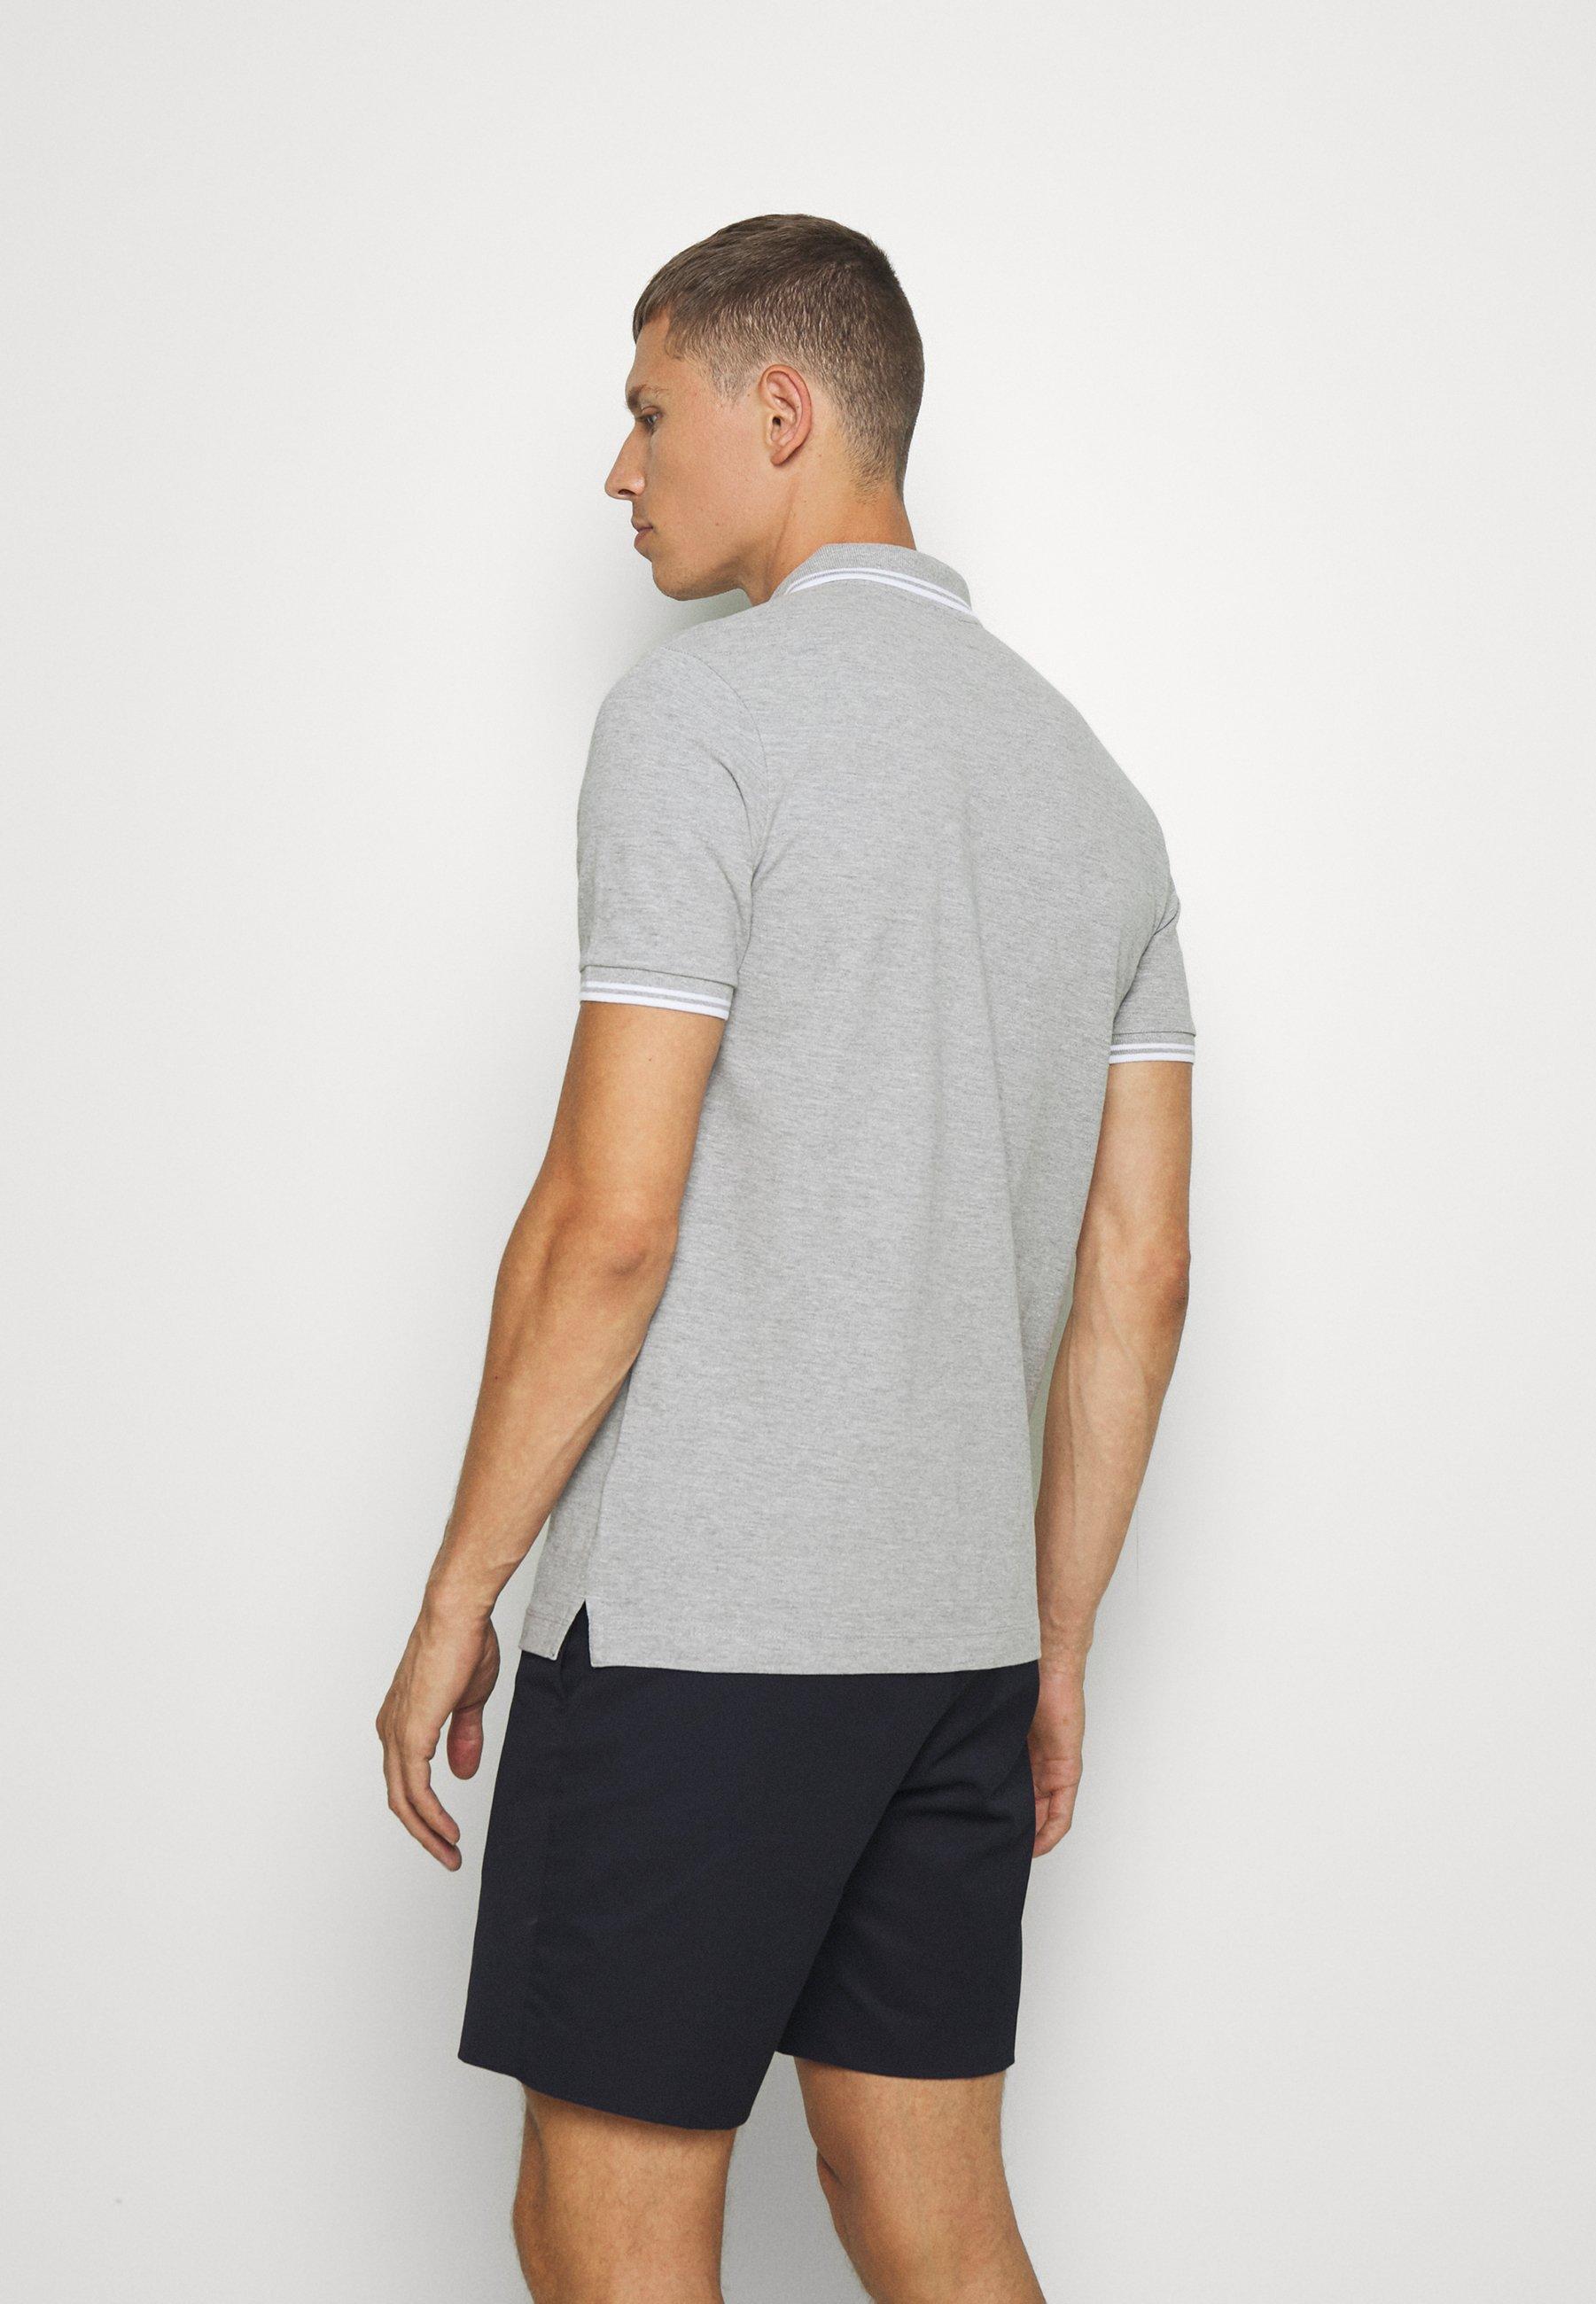 Lindbergh CONTRAST PIPING - Polo shirt - light grey 9UbKC